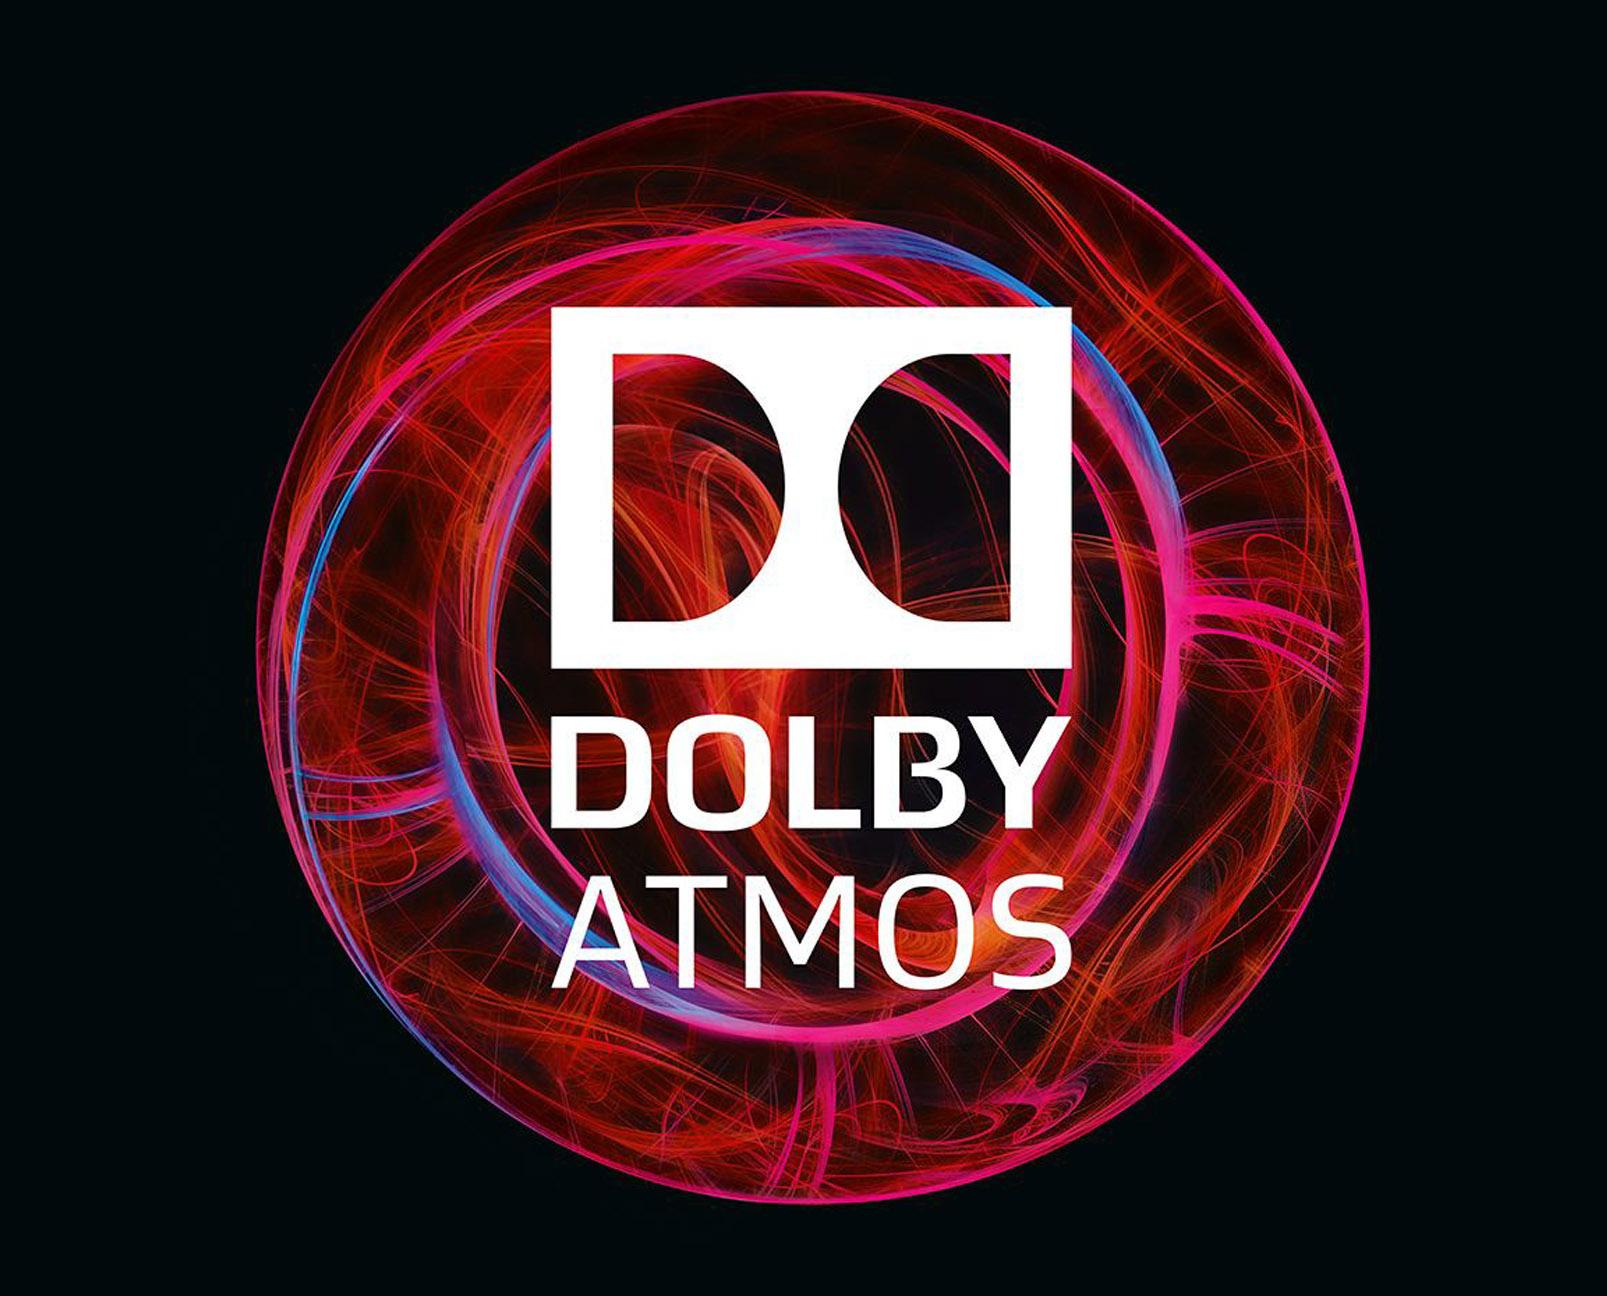 dolby atmost crop.jpg